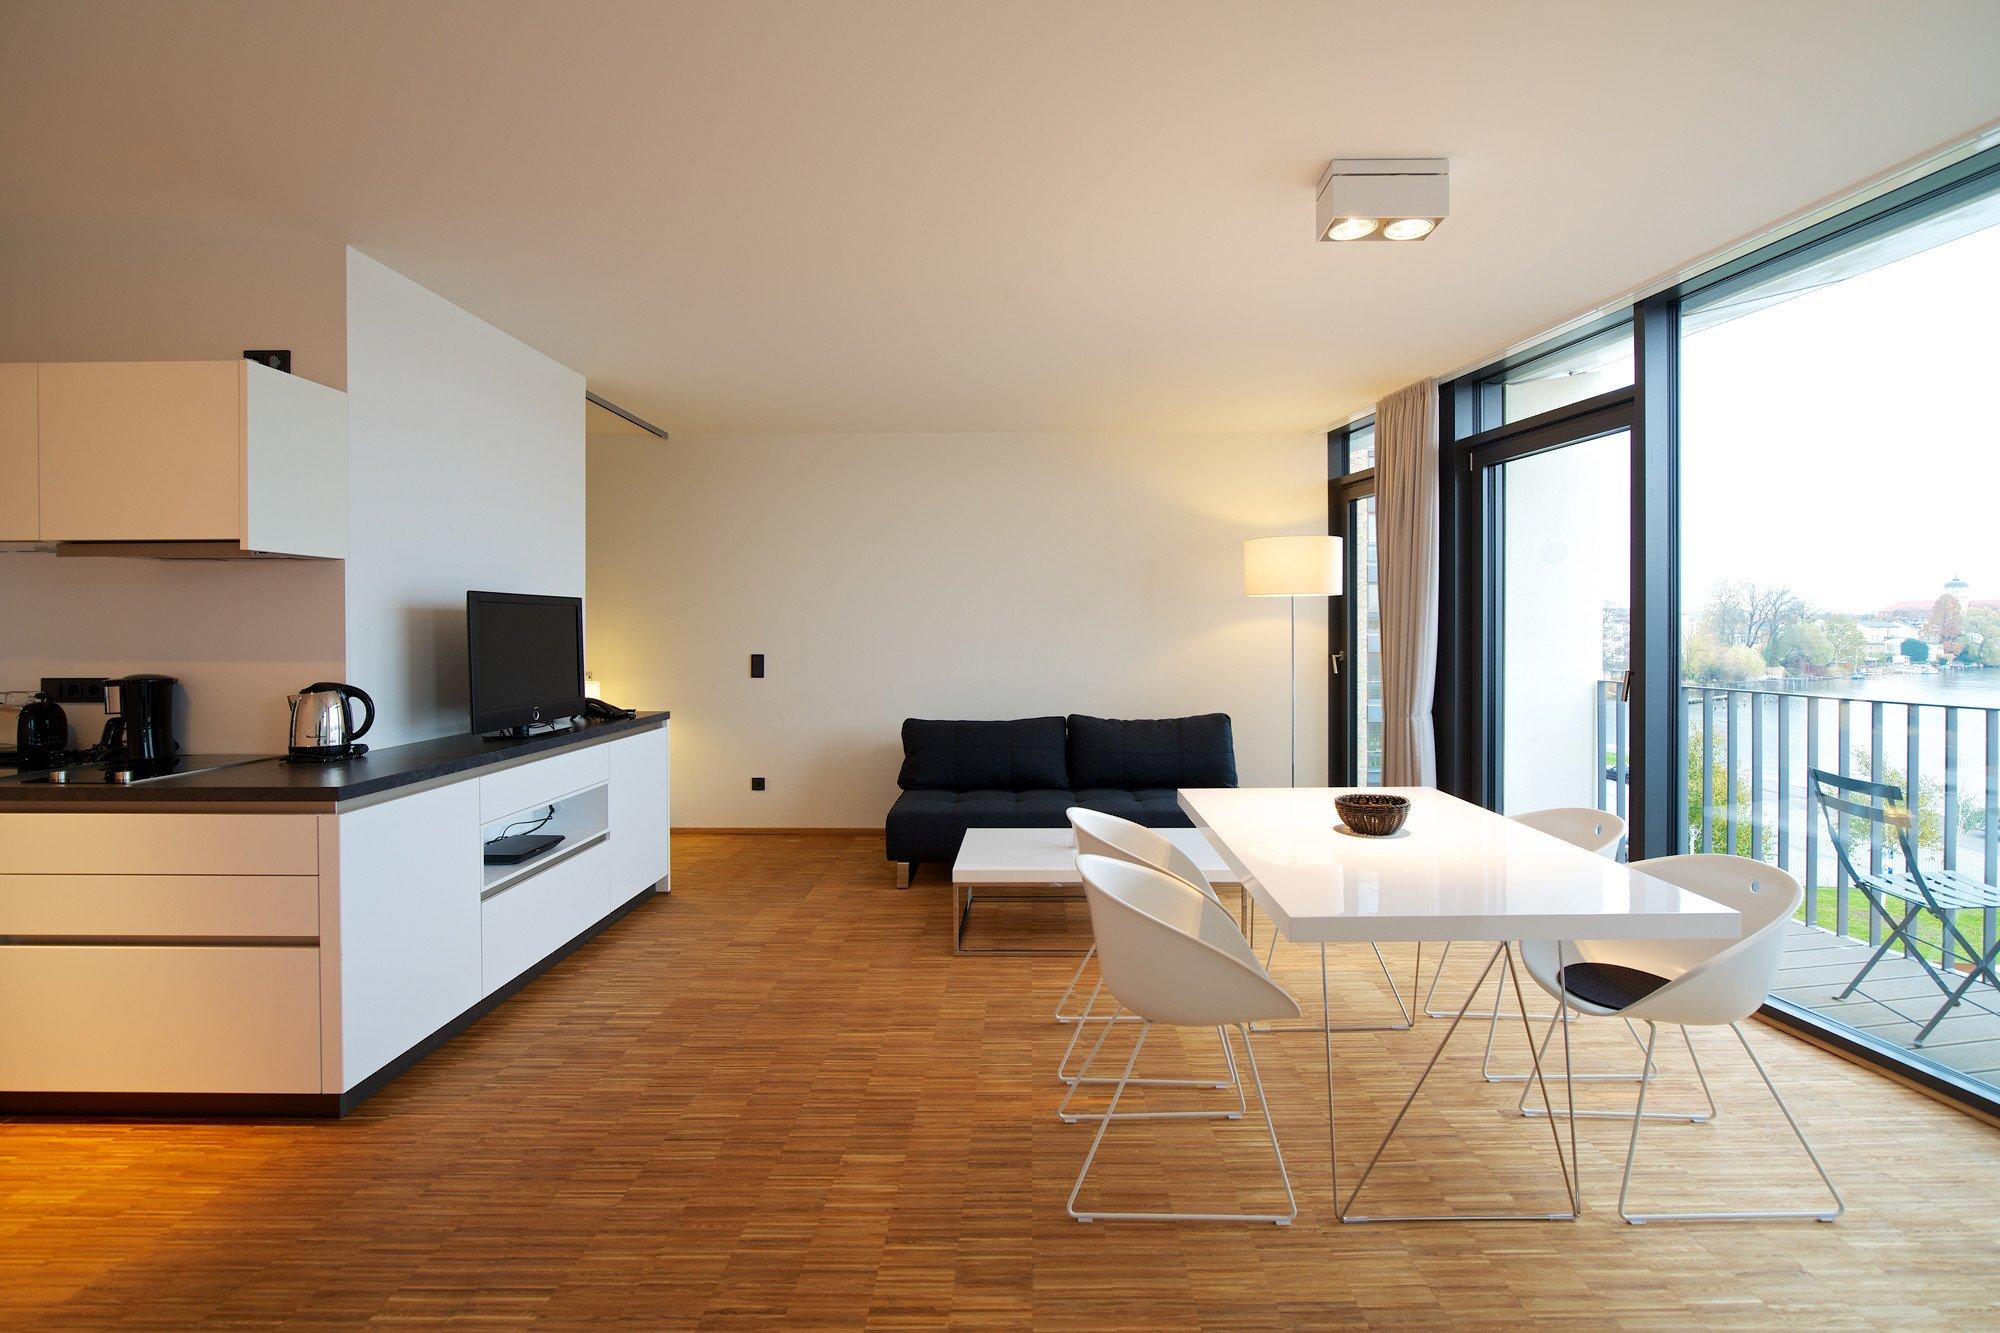 boardinghouse schiffbauergasse in potsdam heizung. Black Bedroom Furniture Sets. Home Design Ideas